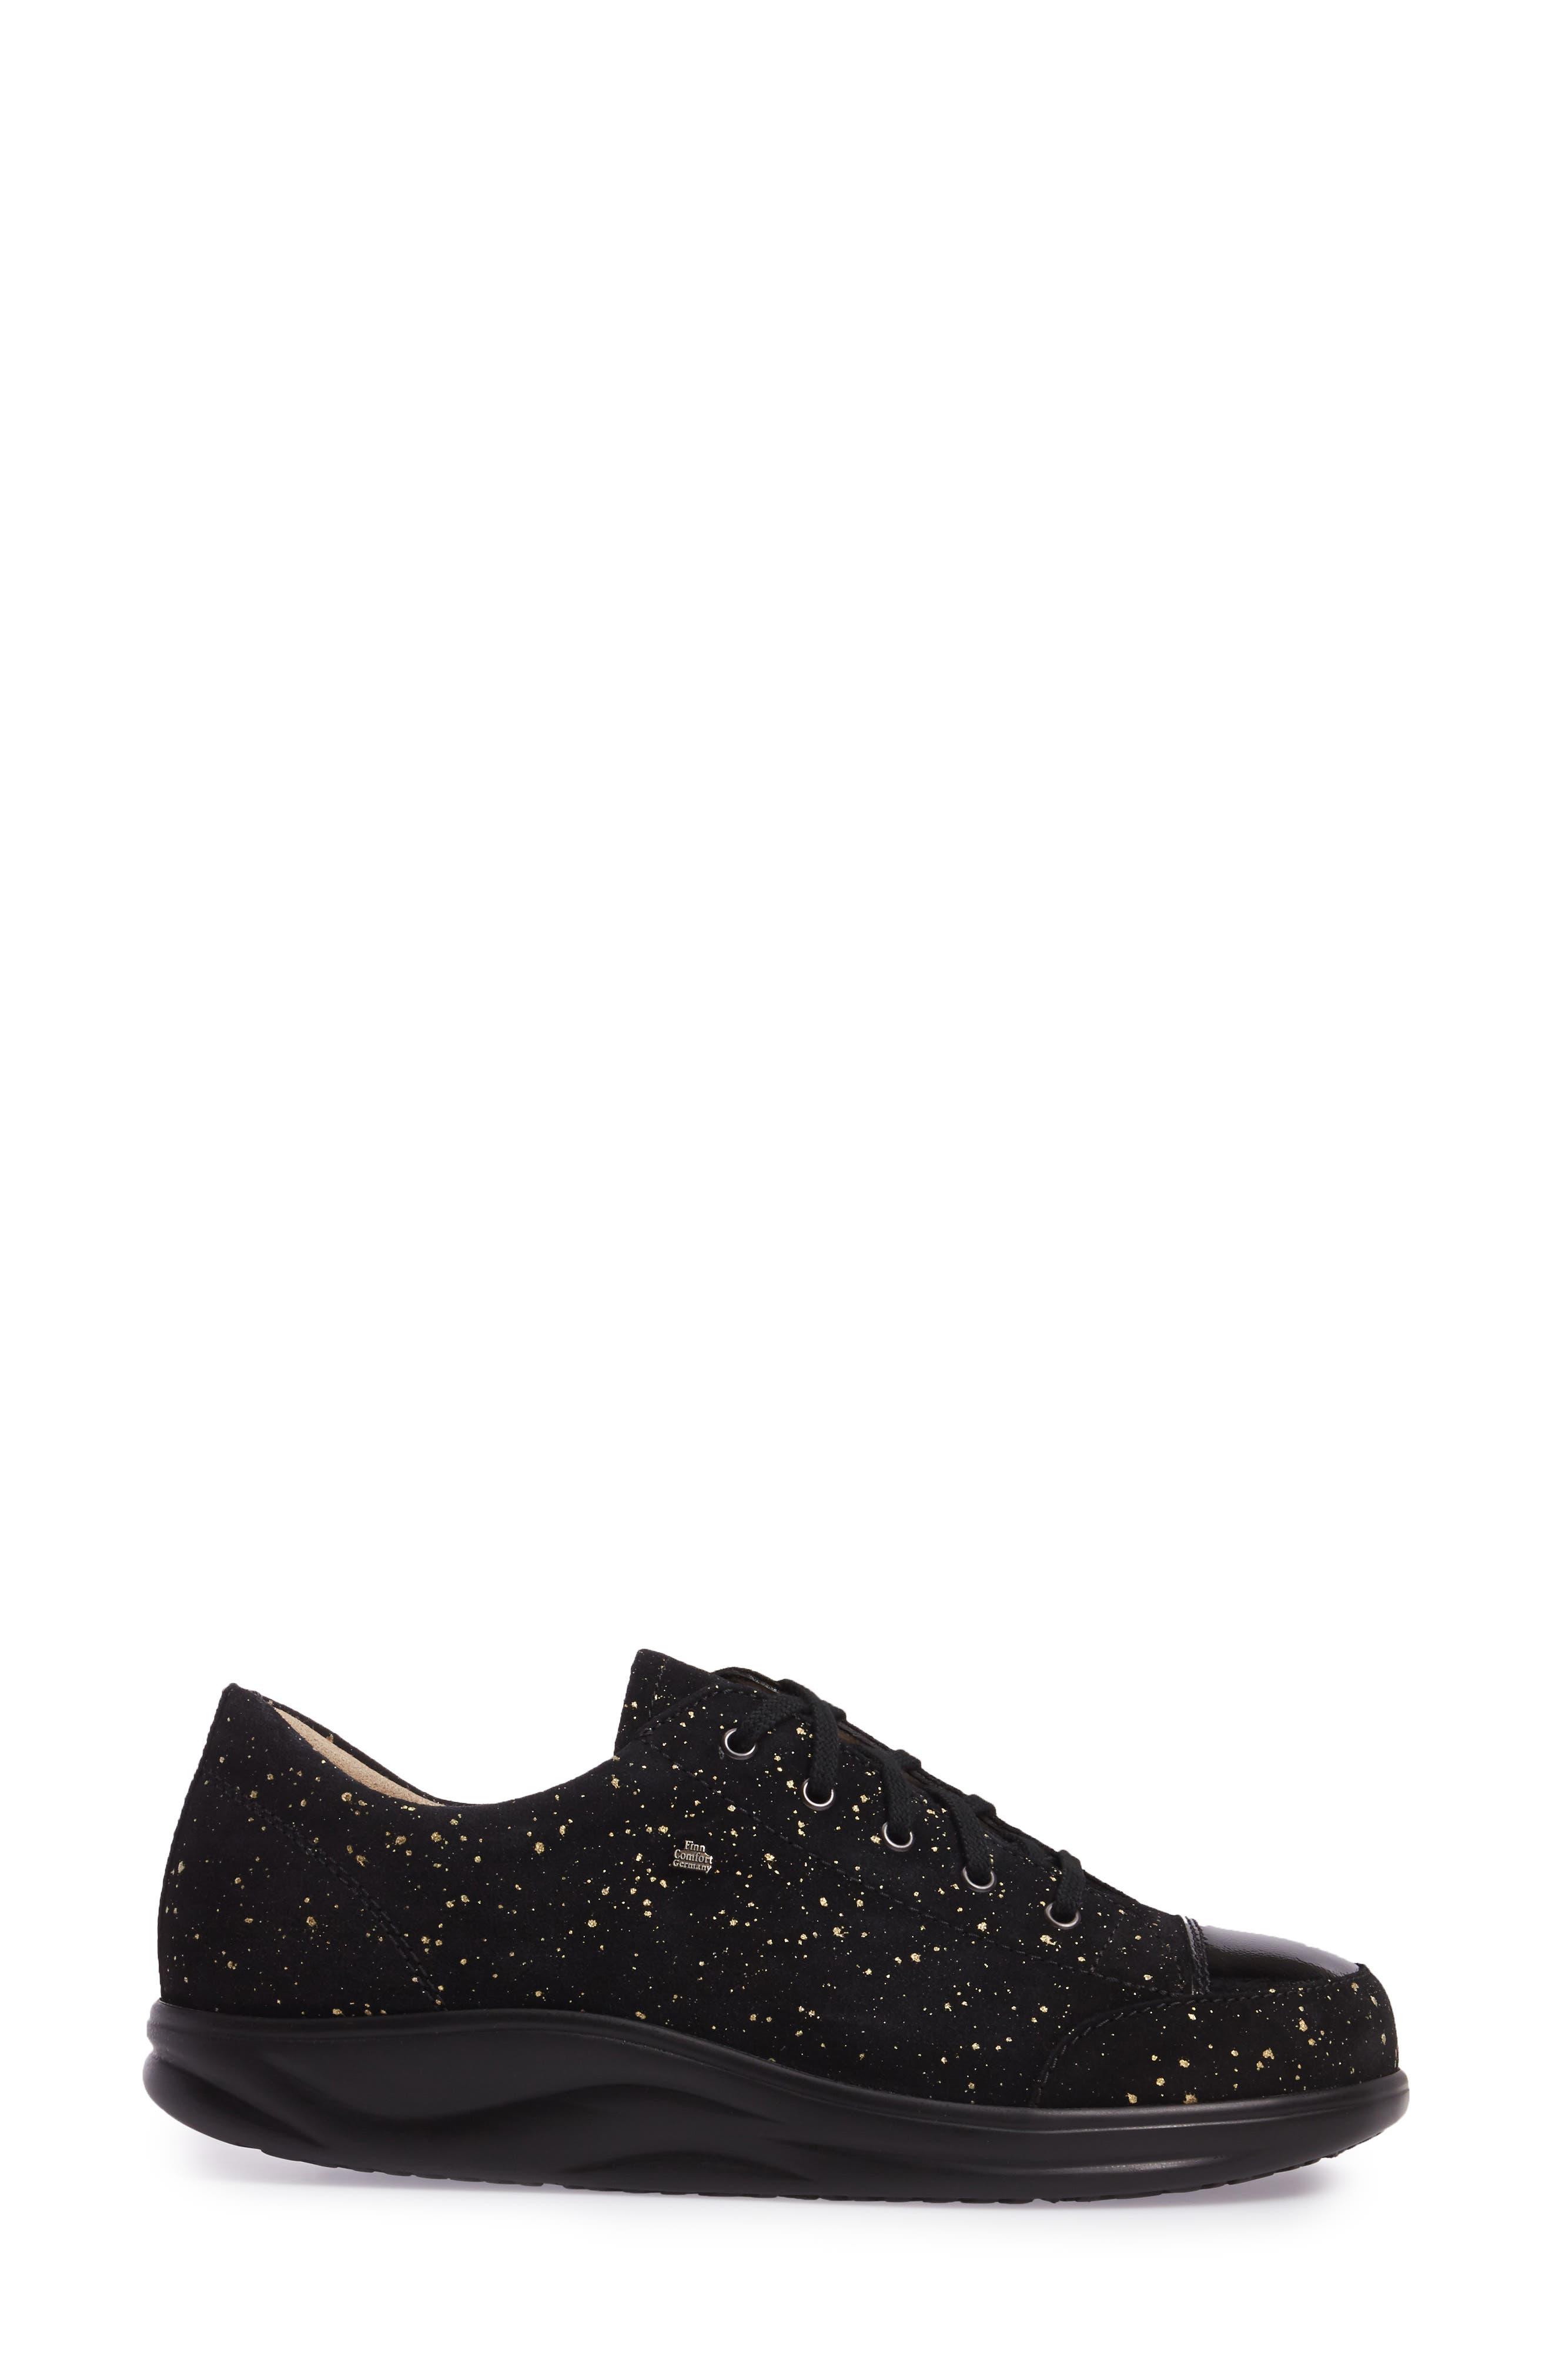 Alternate Image 3  - FINNAMIC by Finn Comfort 'Ikebukuro' Walking Shoe